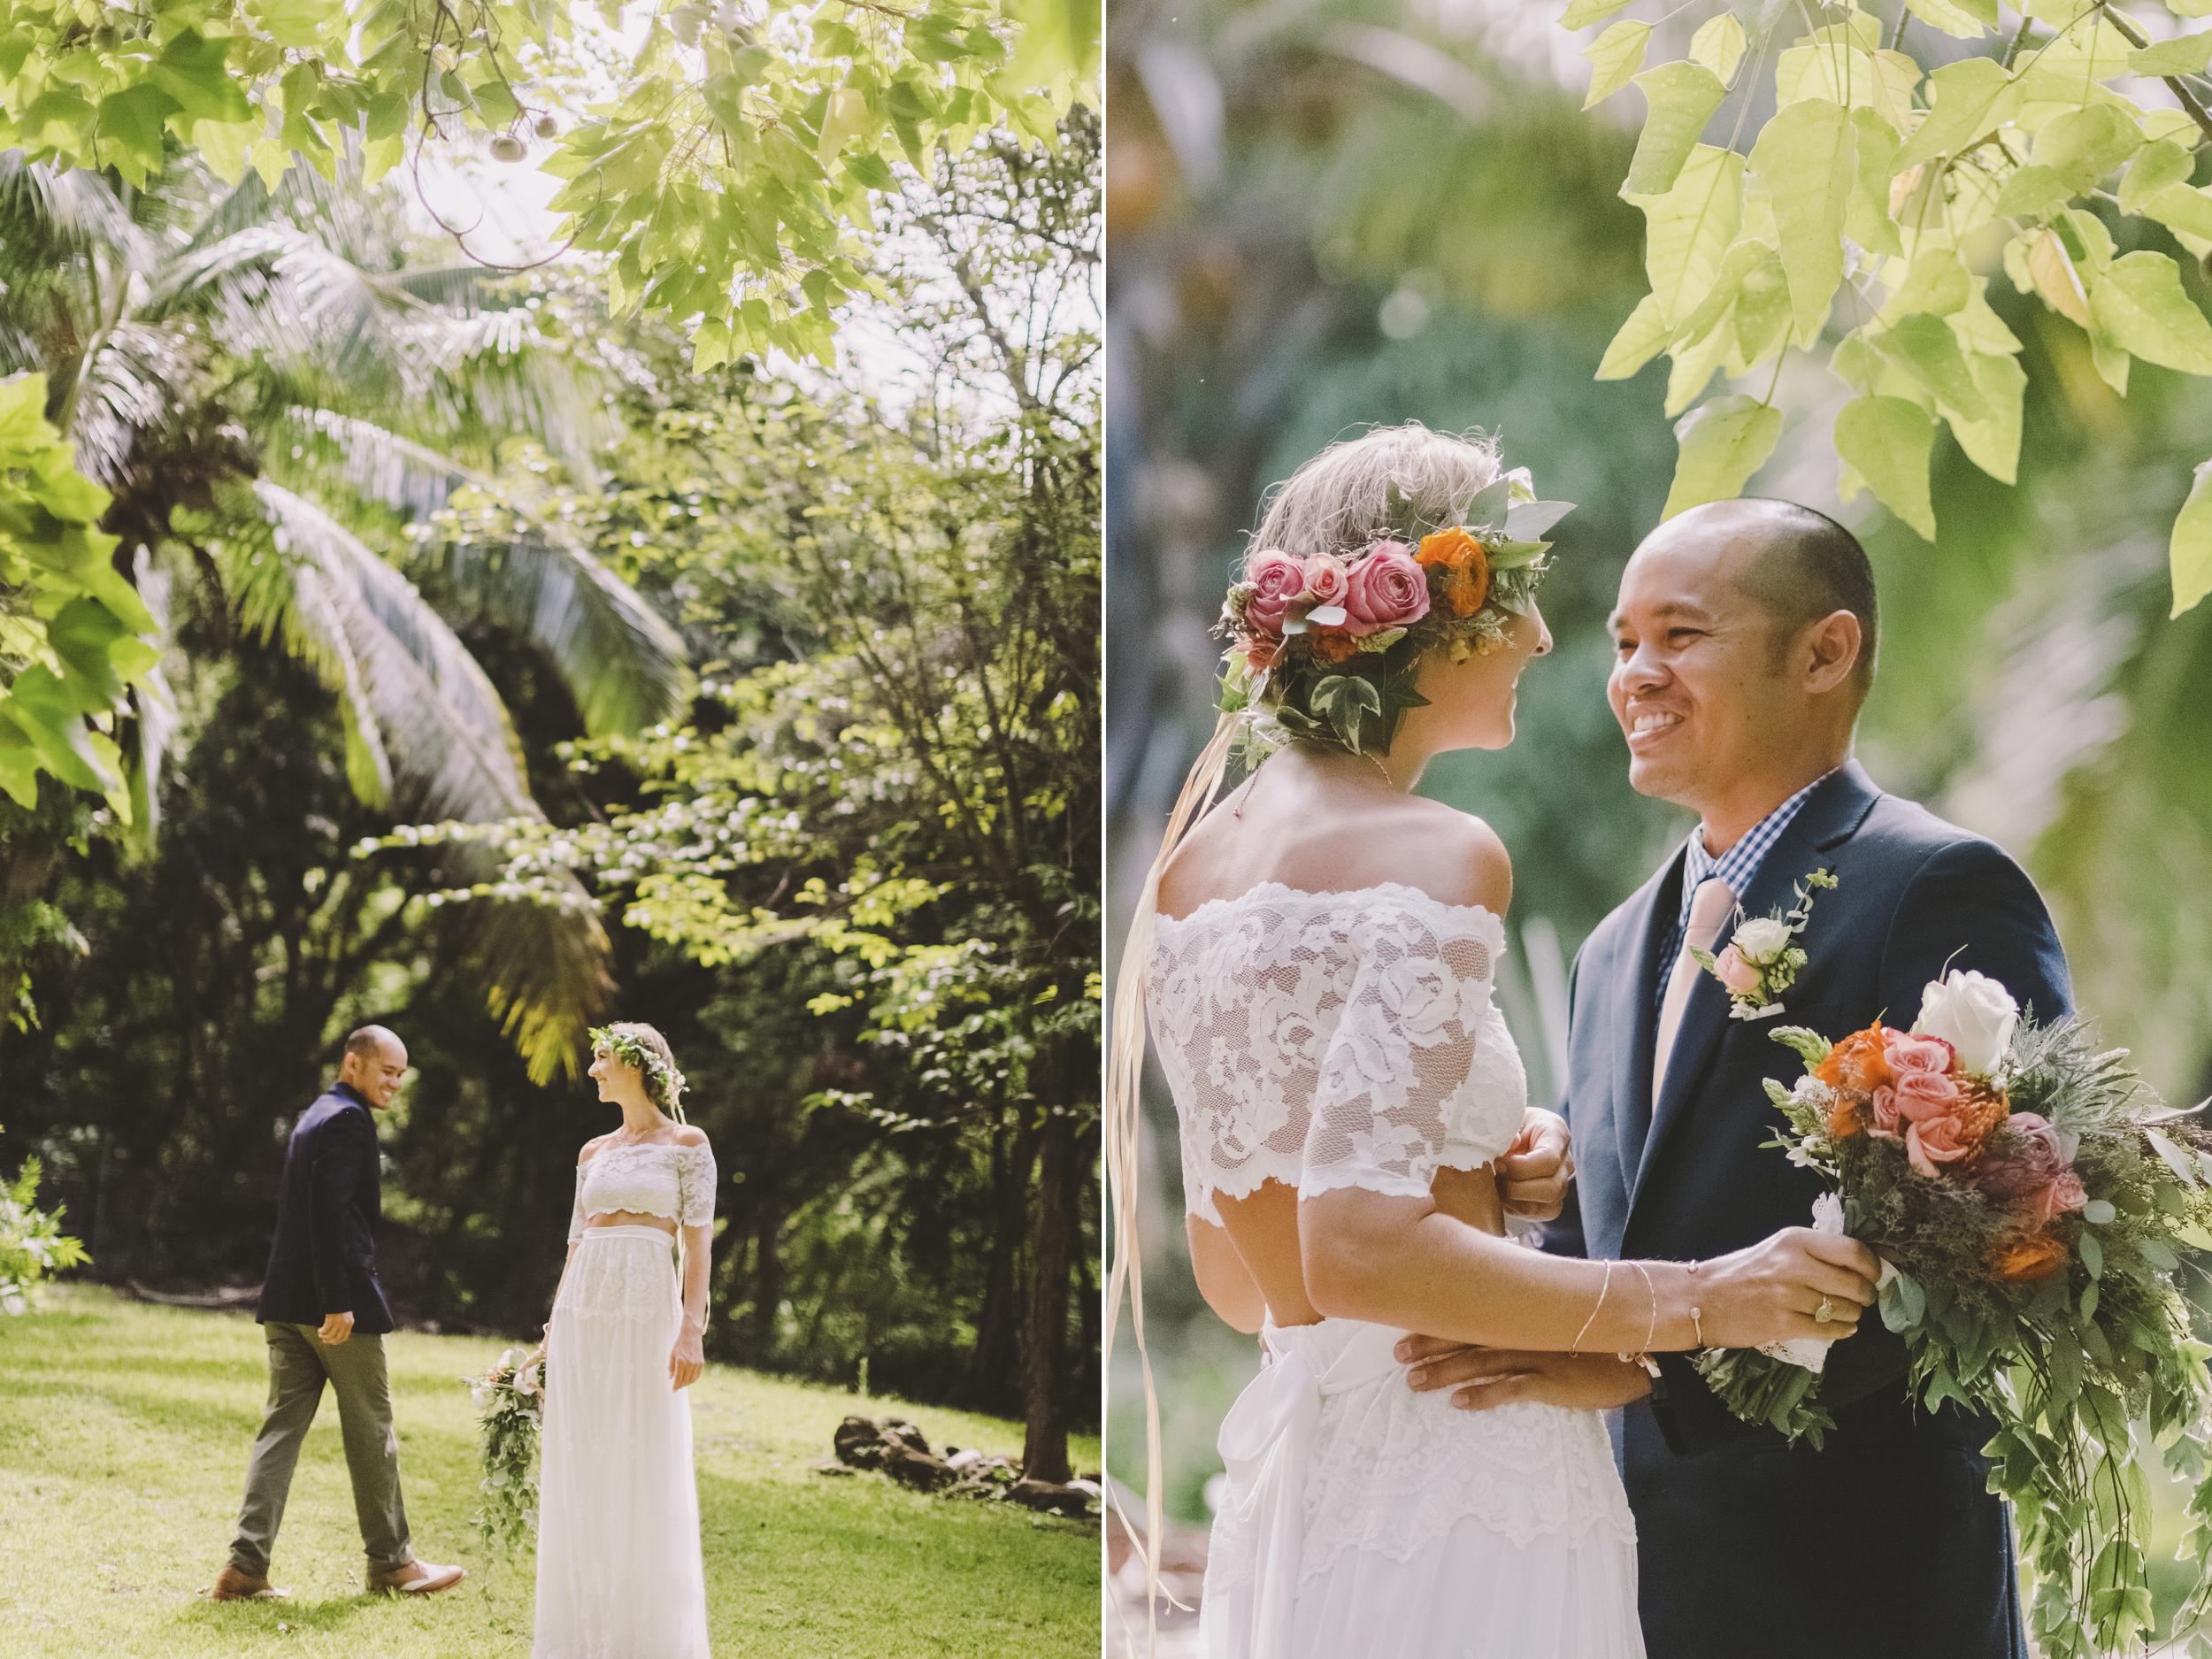 angie-diaz-photography-oahu-hawaii-wedding-tradewinds-ranch-40.jpg